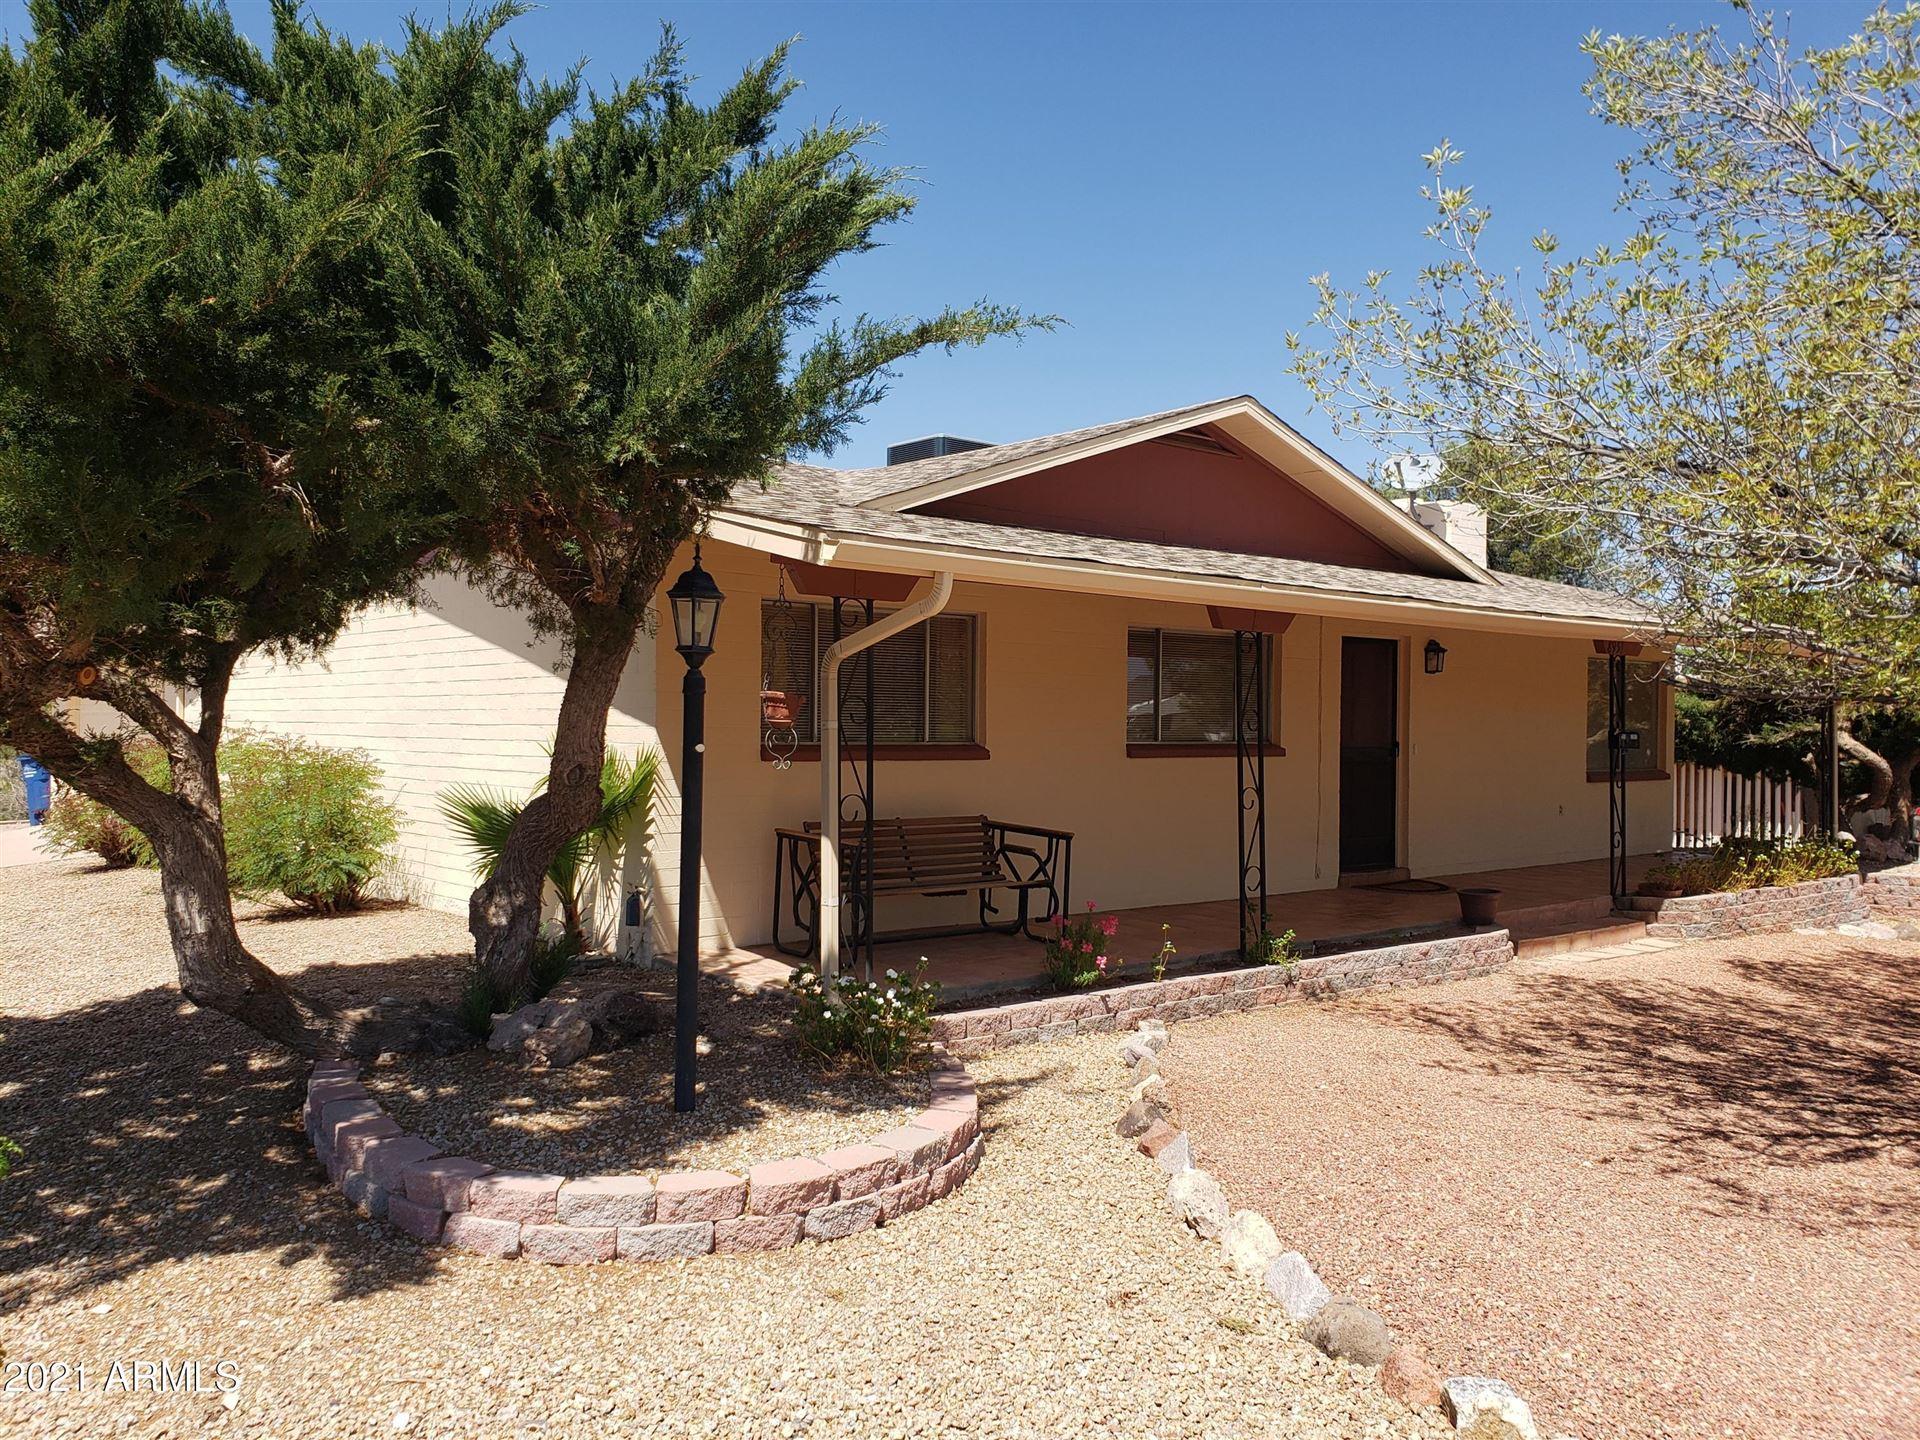 895 S Yaqui Drive, Wickenburg, AZ 85390 - MLS#: 6220352